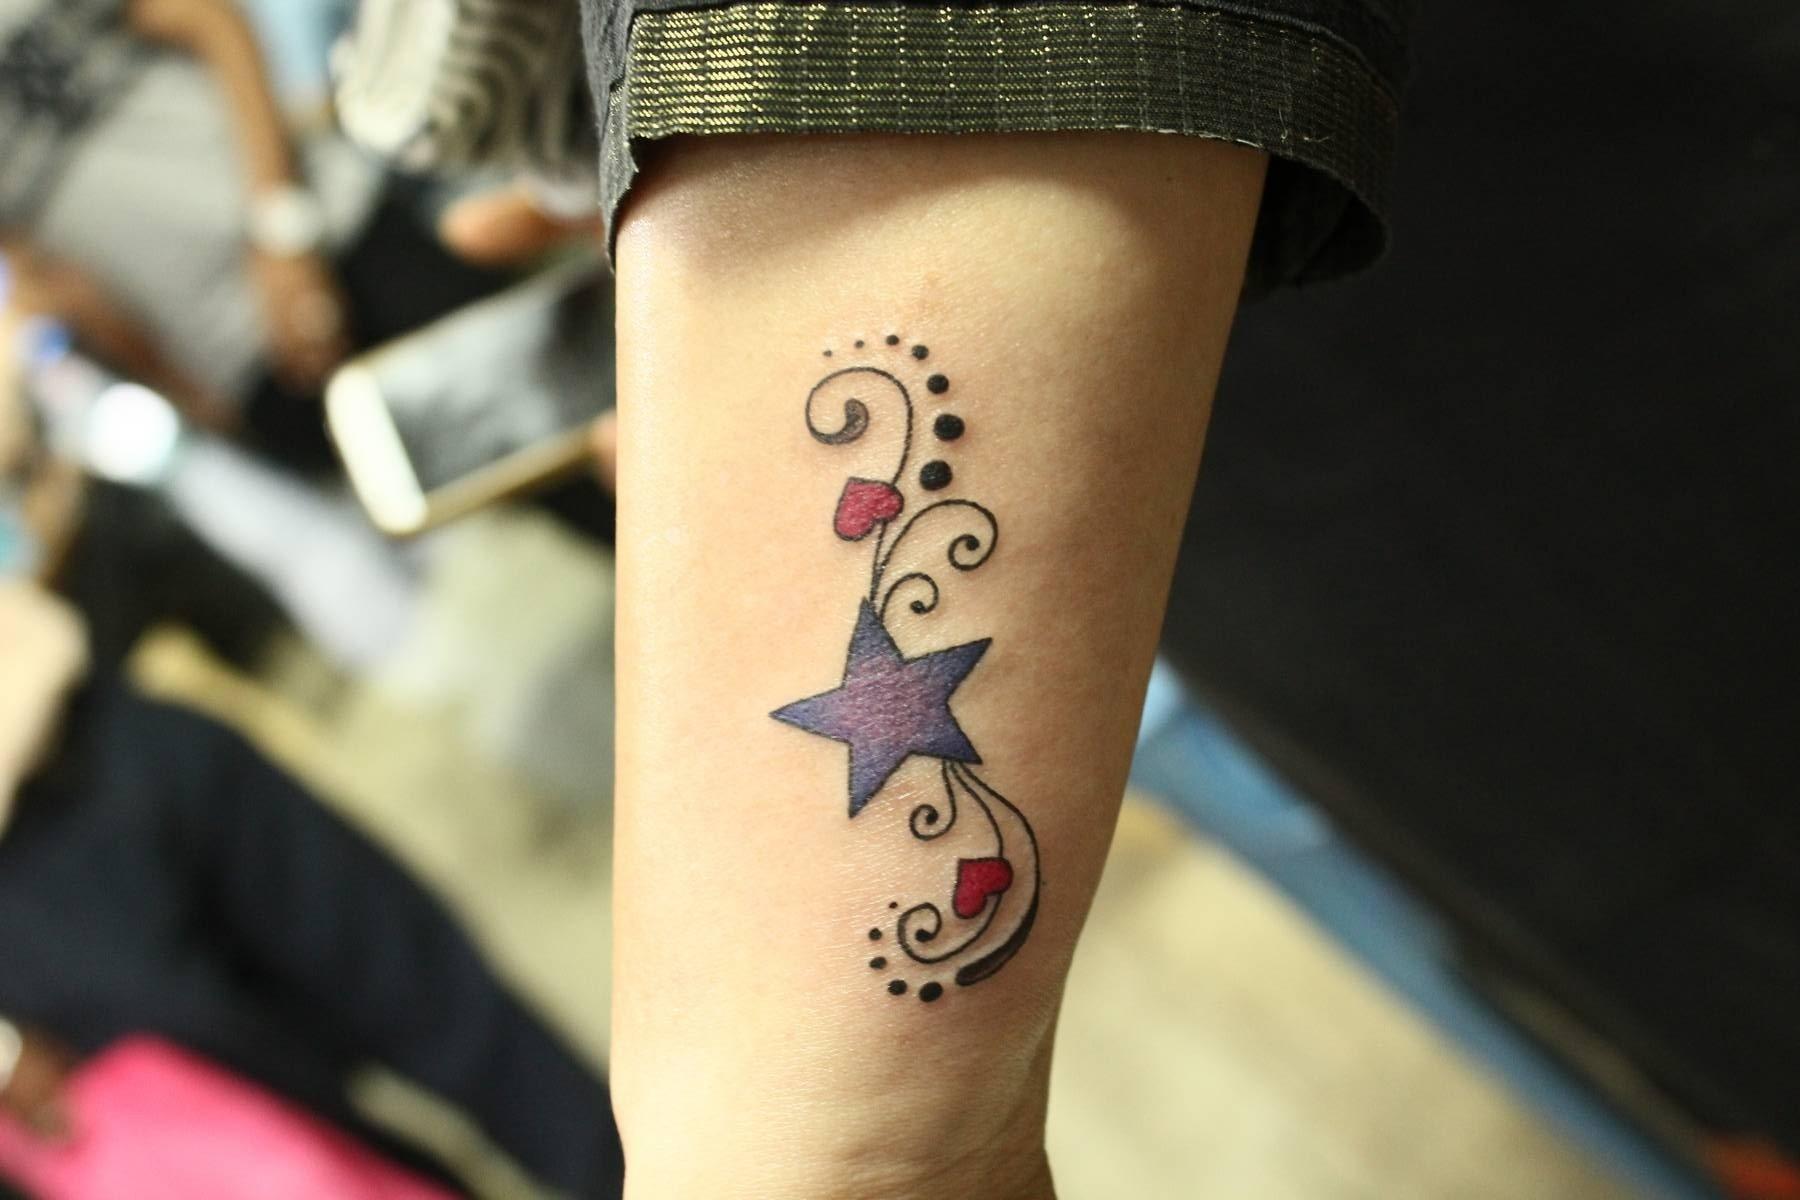 10 Fashionable Unique Tattoo Ideas For Girls minimalist tattoos archives black poison tattoo studio 2021